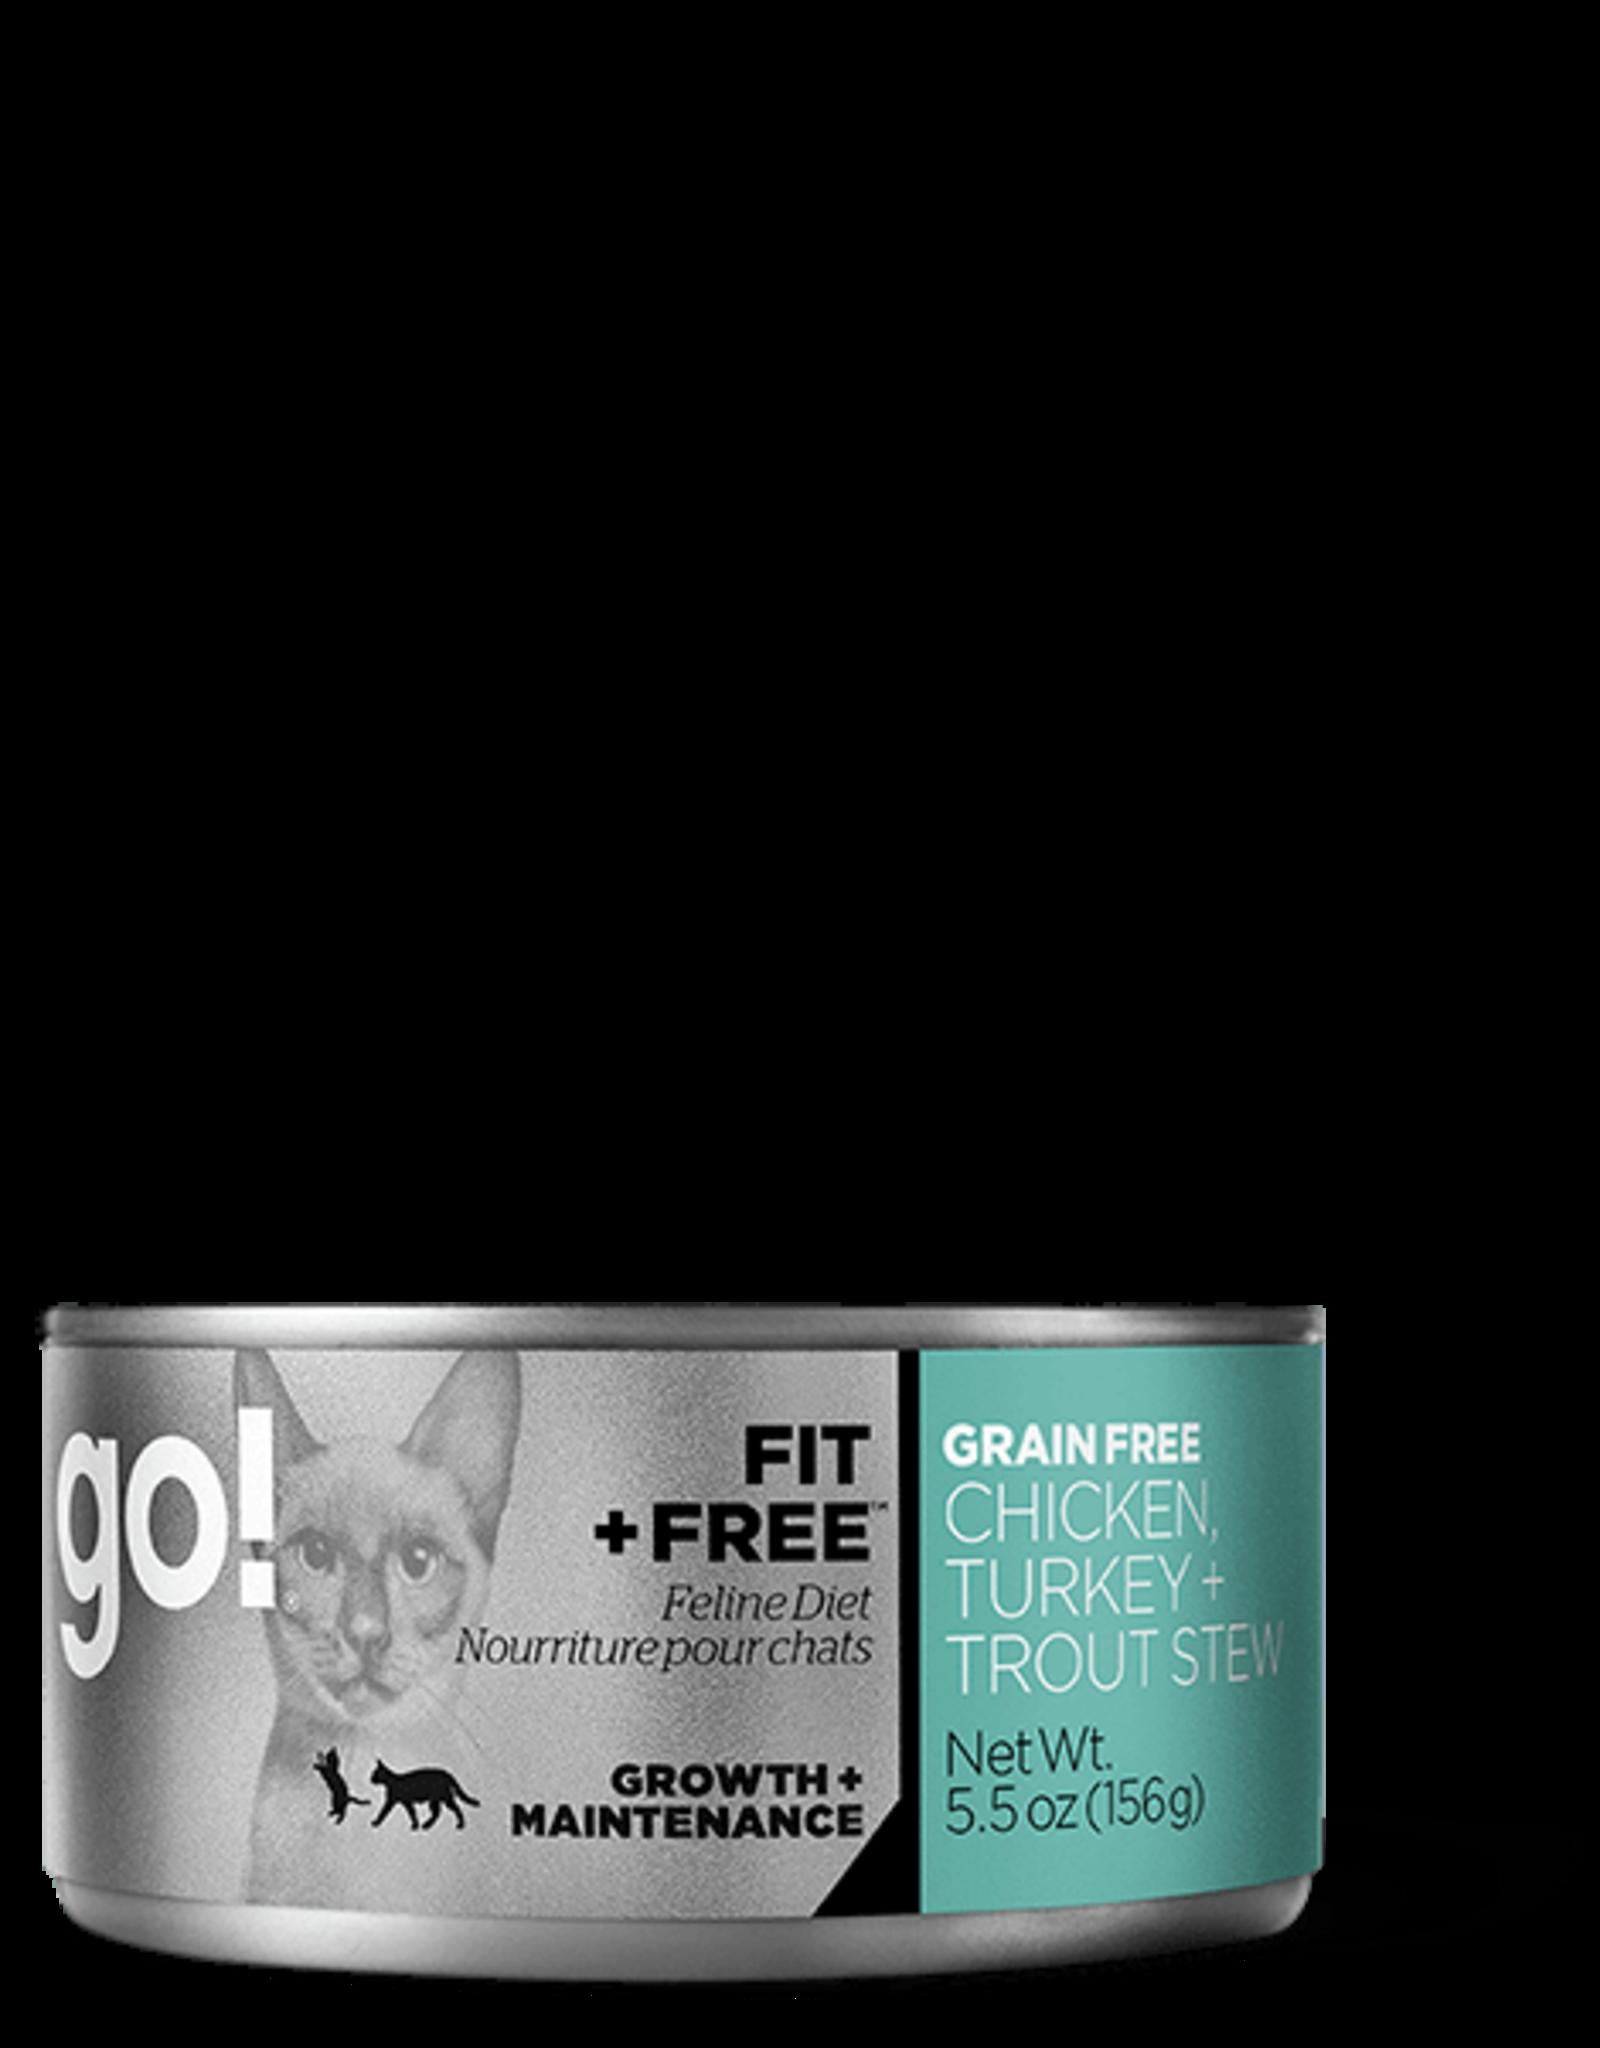 Petcurean Go Fit+Free Cat Grain Free Chick Turkey Trout Stew Can 5.5oz